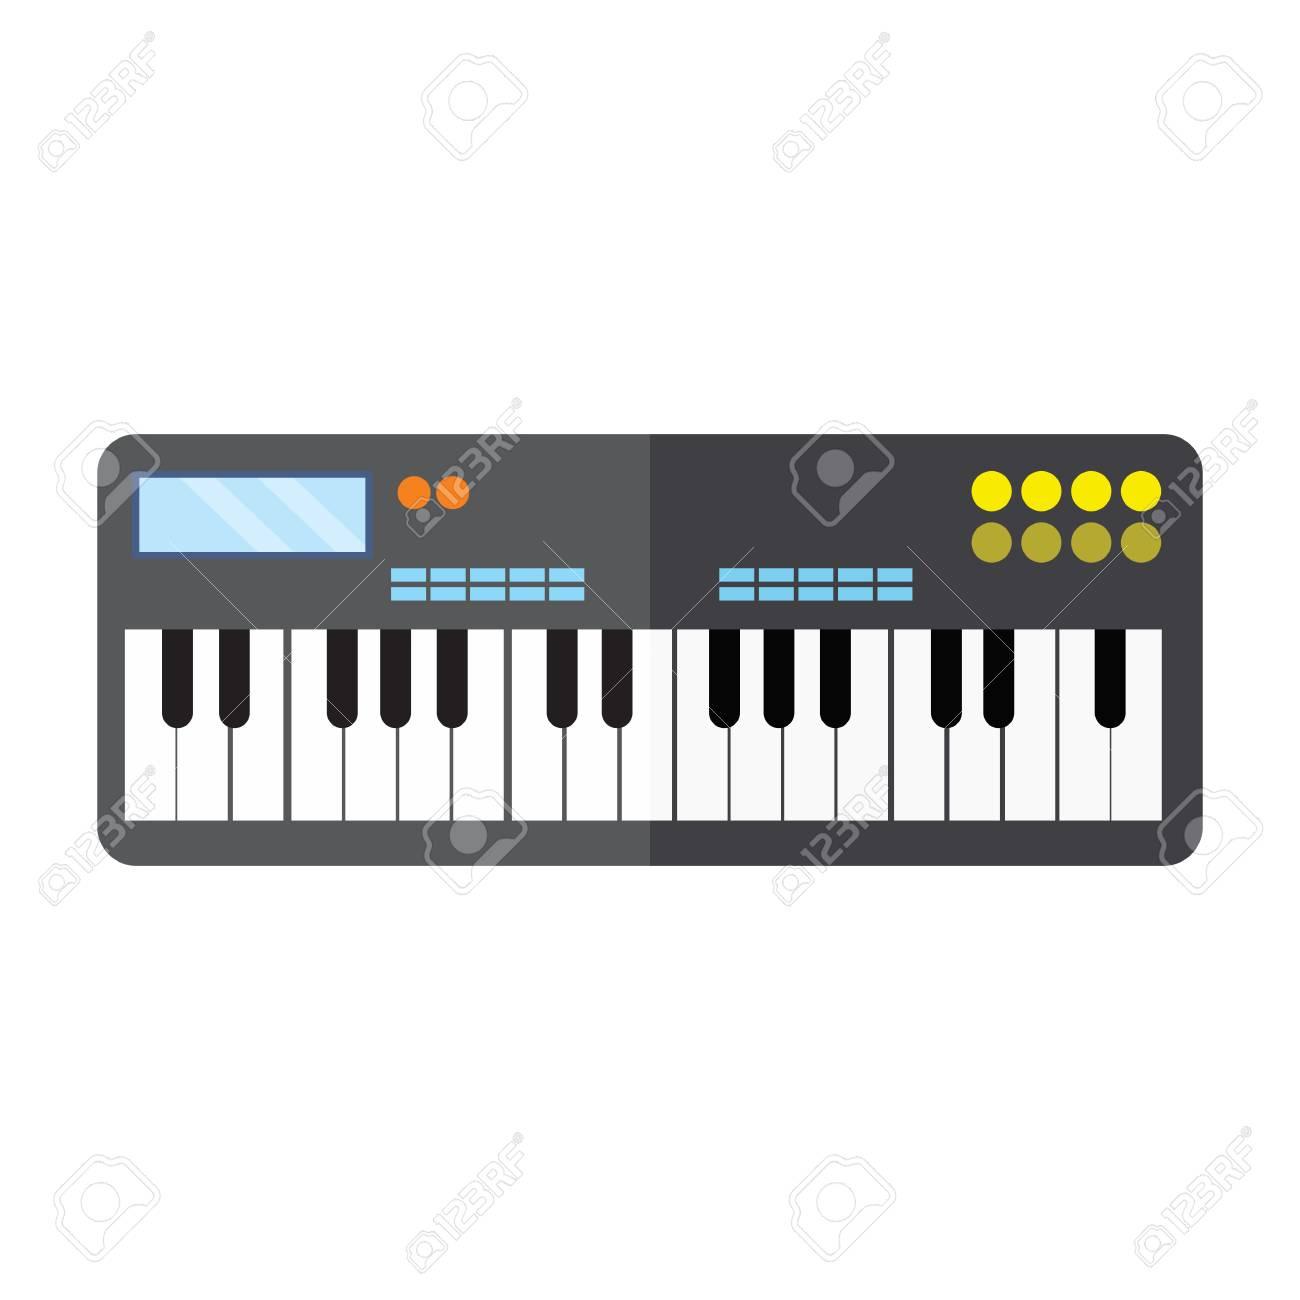 Keyboard Piano Instrument Vector Illustration Graphic Design Stock